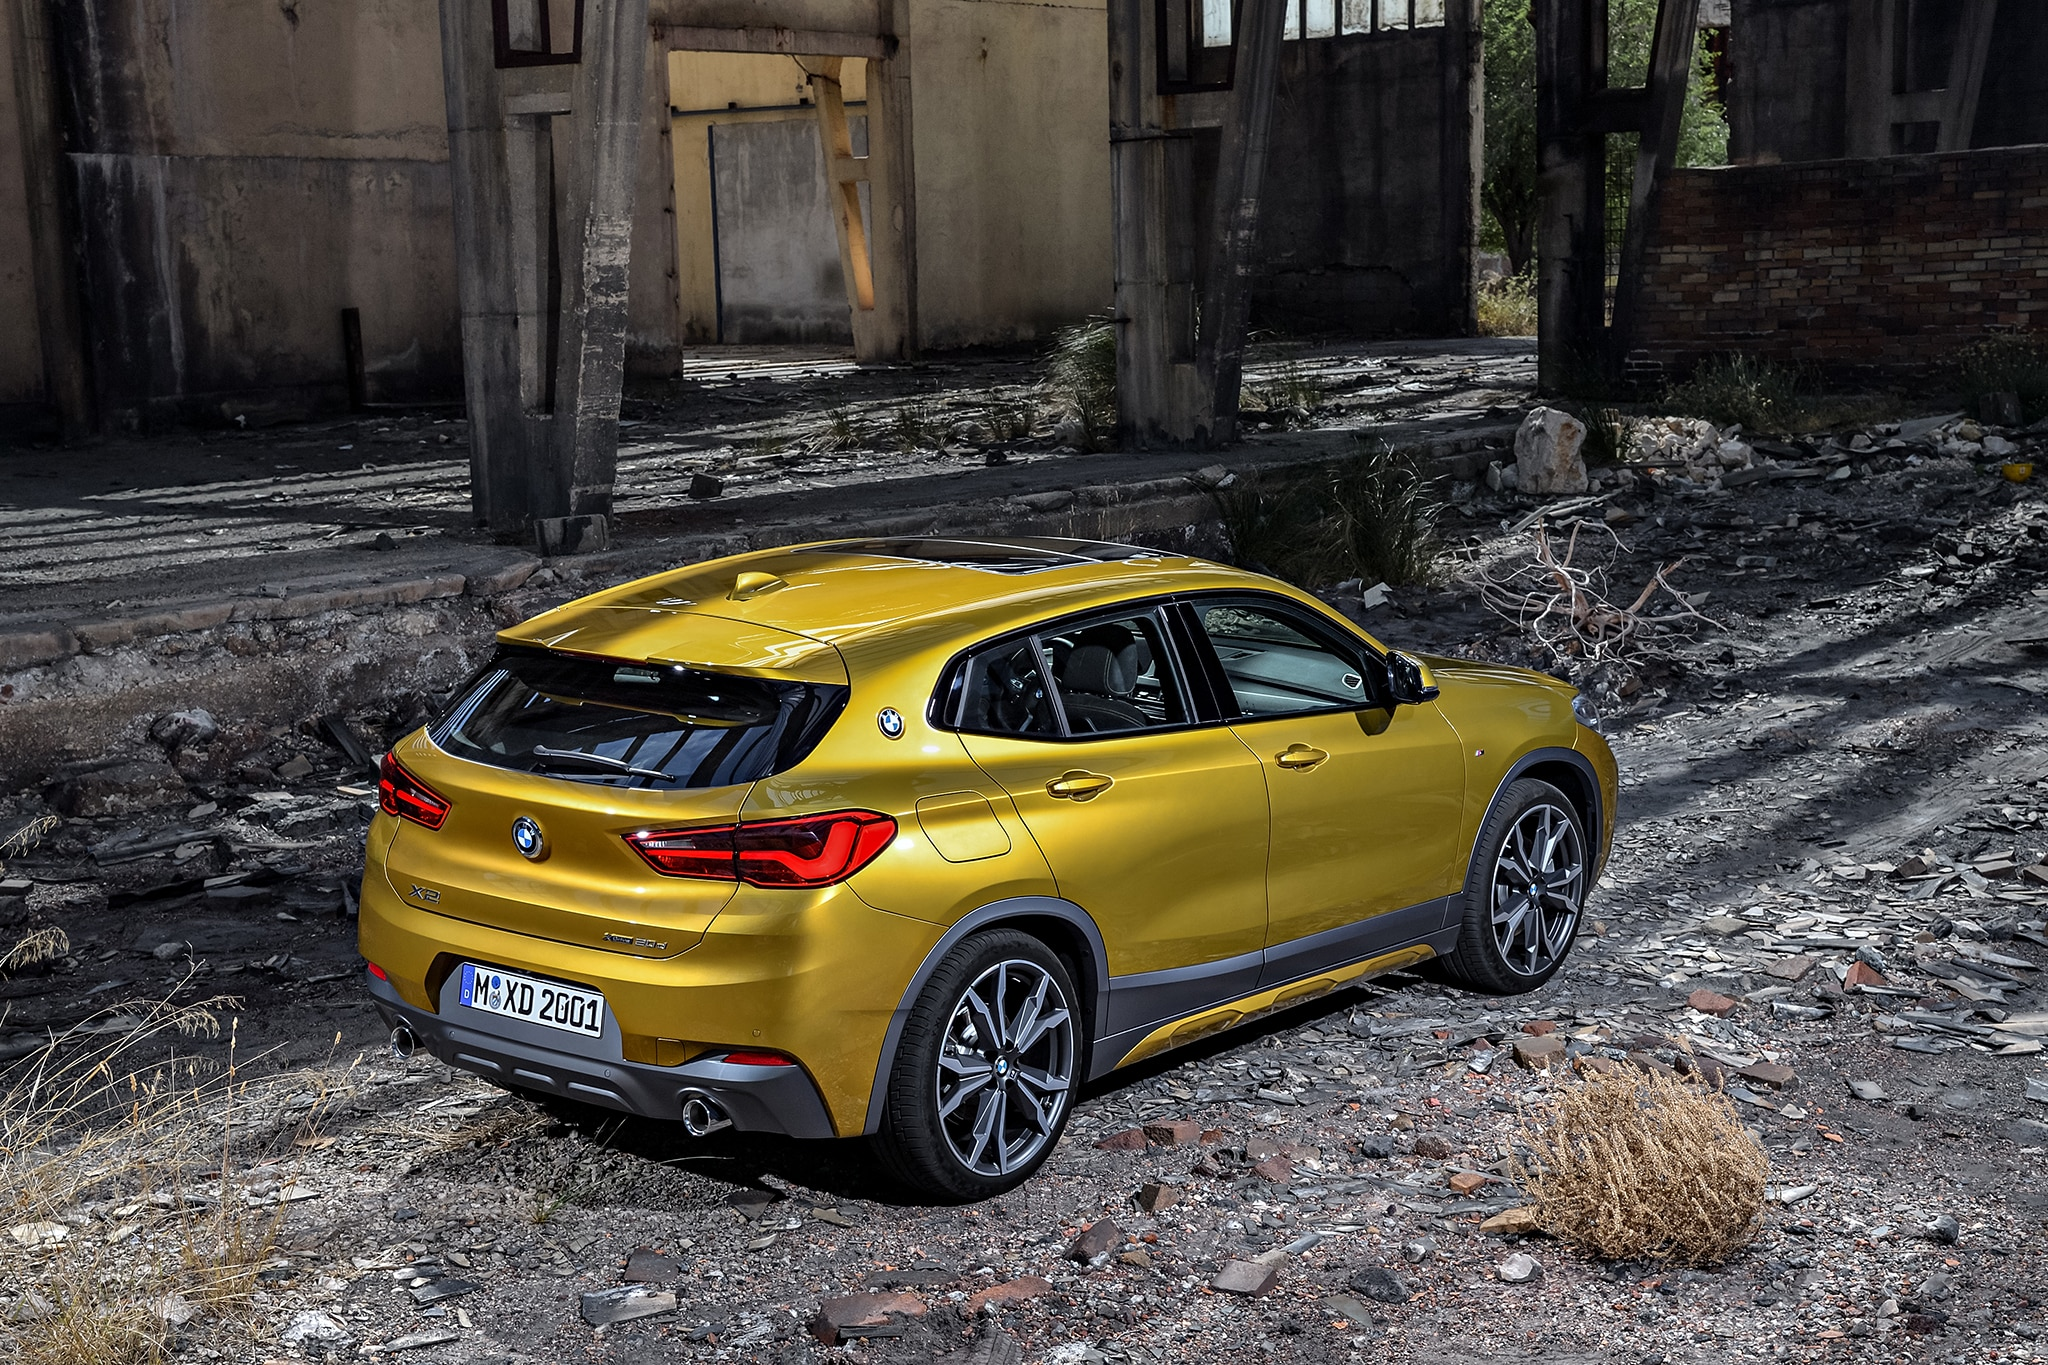 2018-BMW-X2-rear-three-quarter-02 Breathtaking Lamborghini Countach Owners Manual Pdf Cars Trend